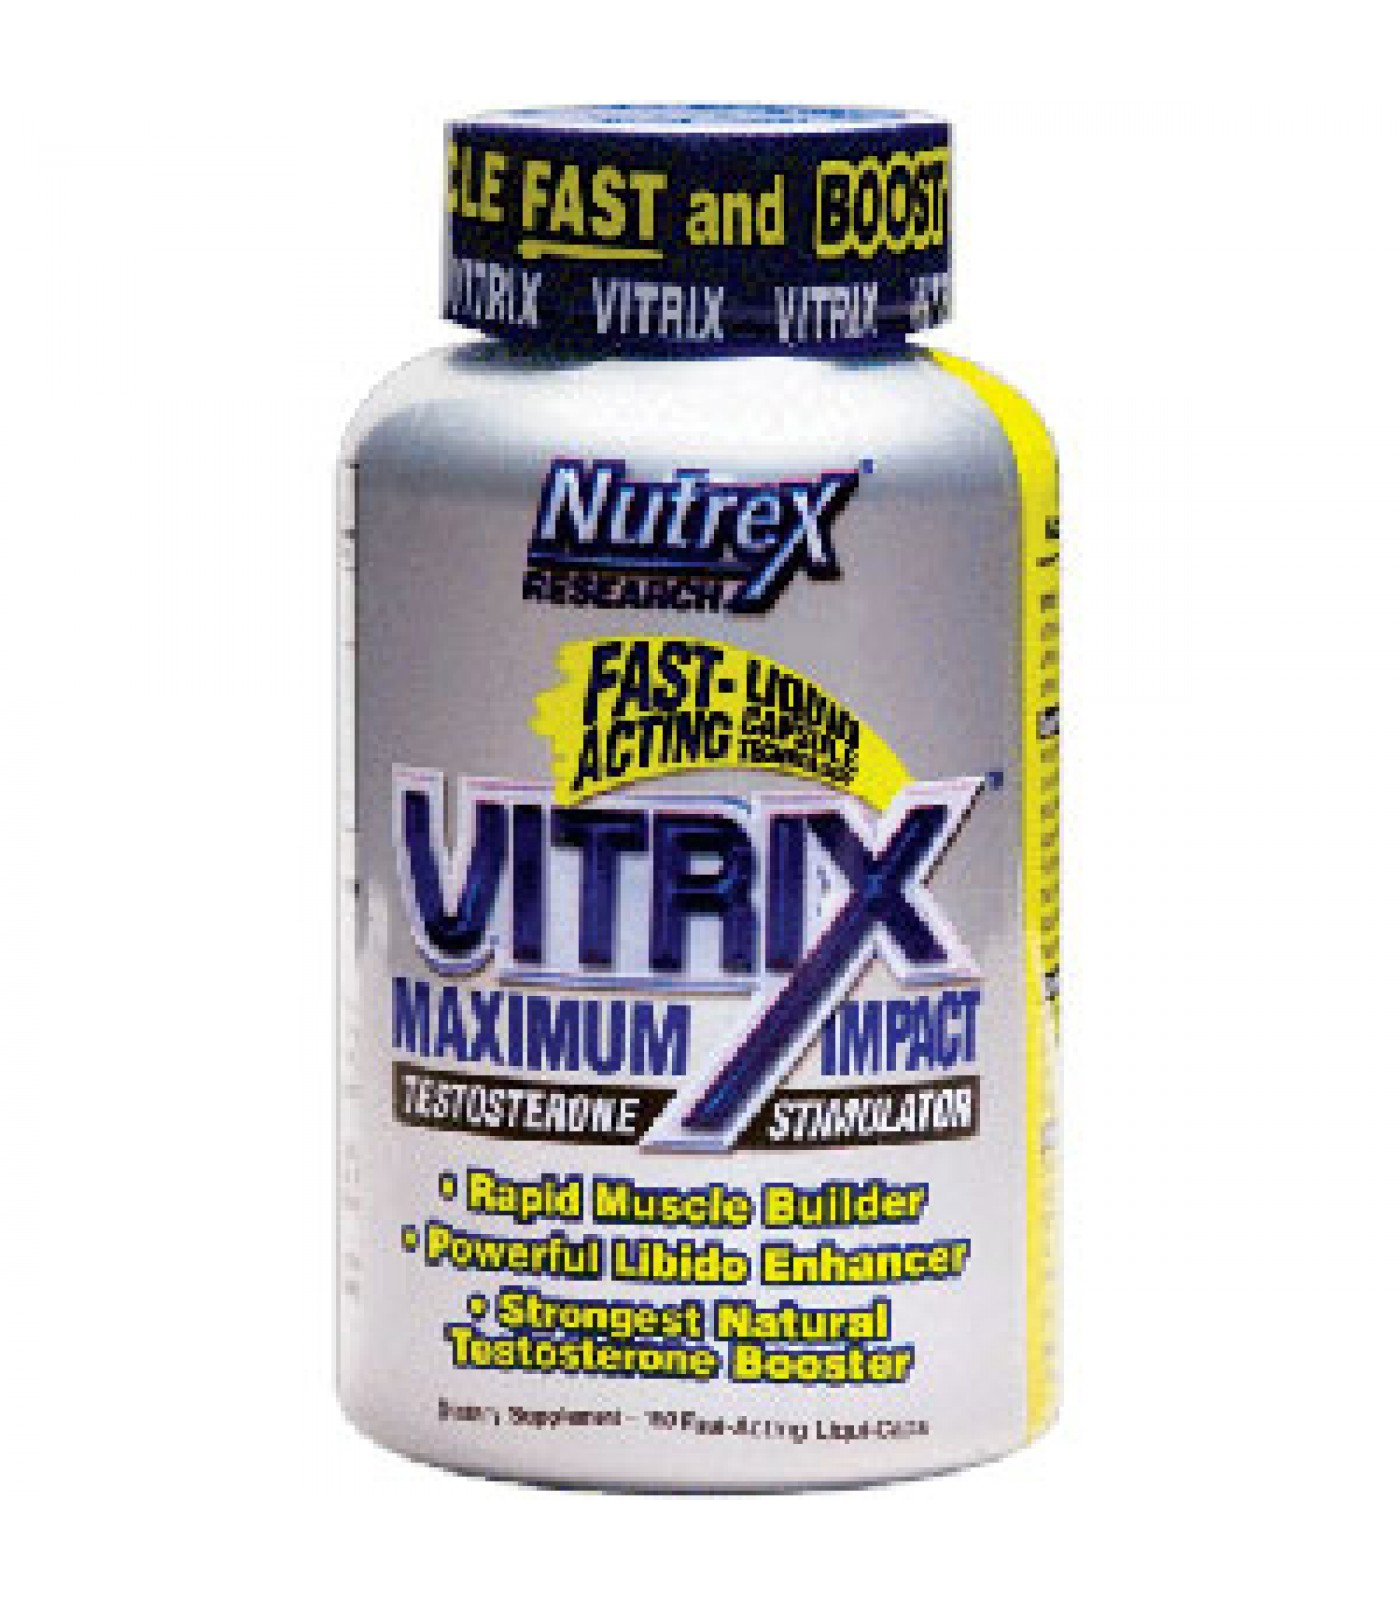 Nutrex - Vitrix NTS-5 / 90 caps